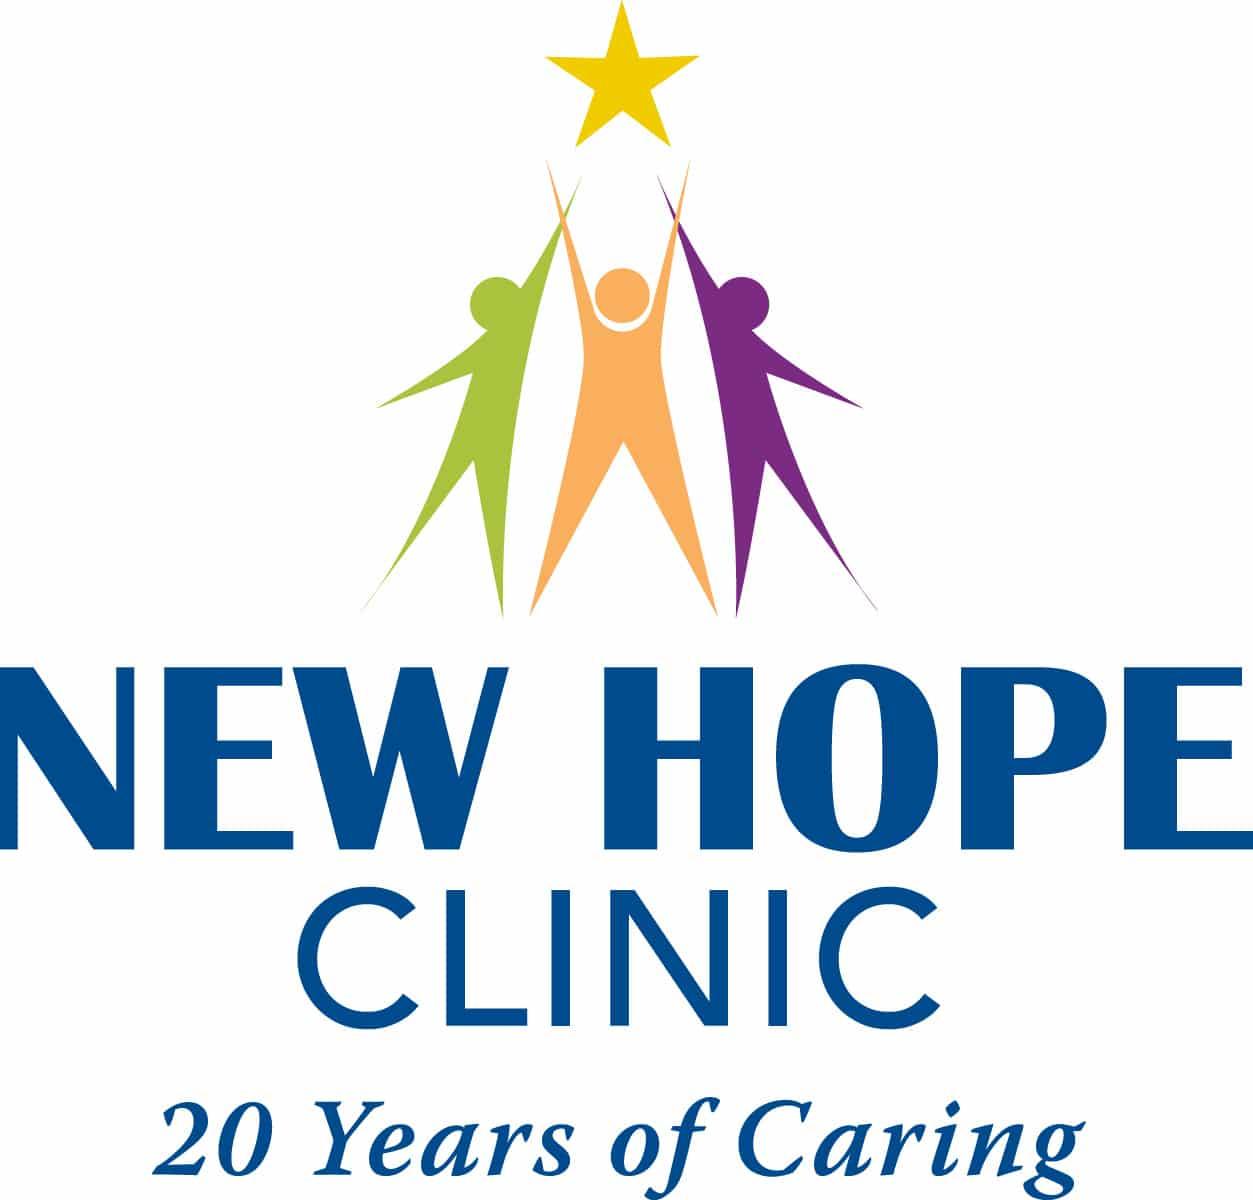 New Hope Clinic – Providing free healthcare to uninsured